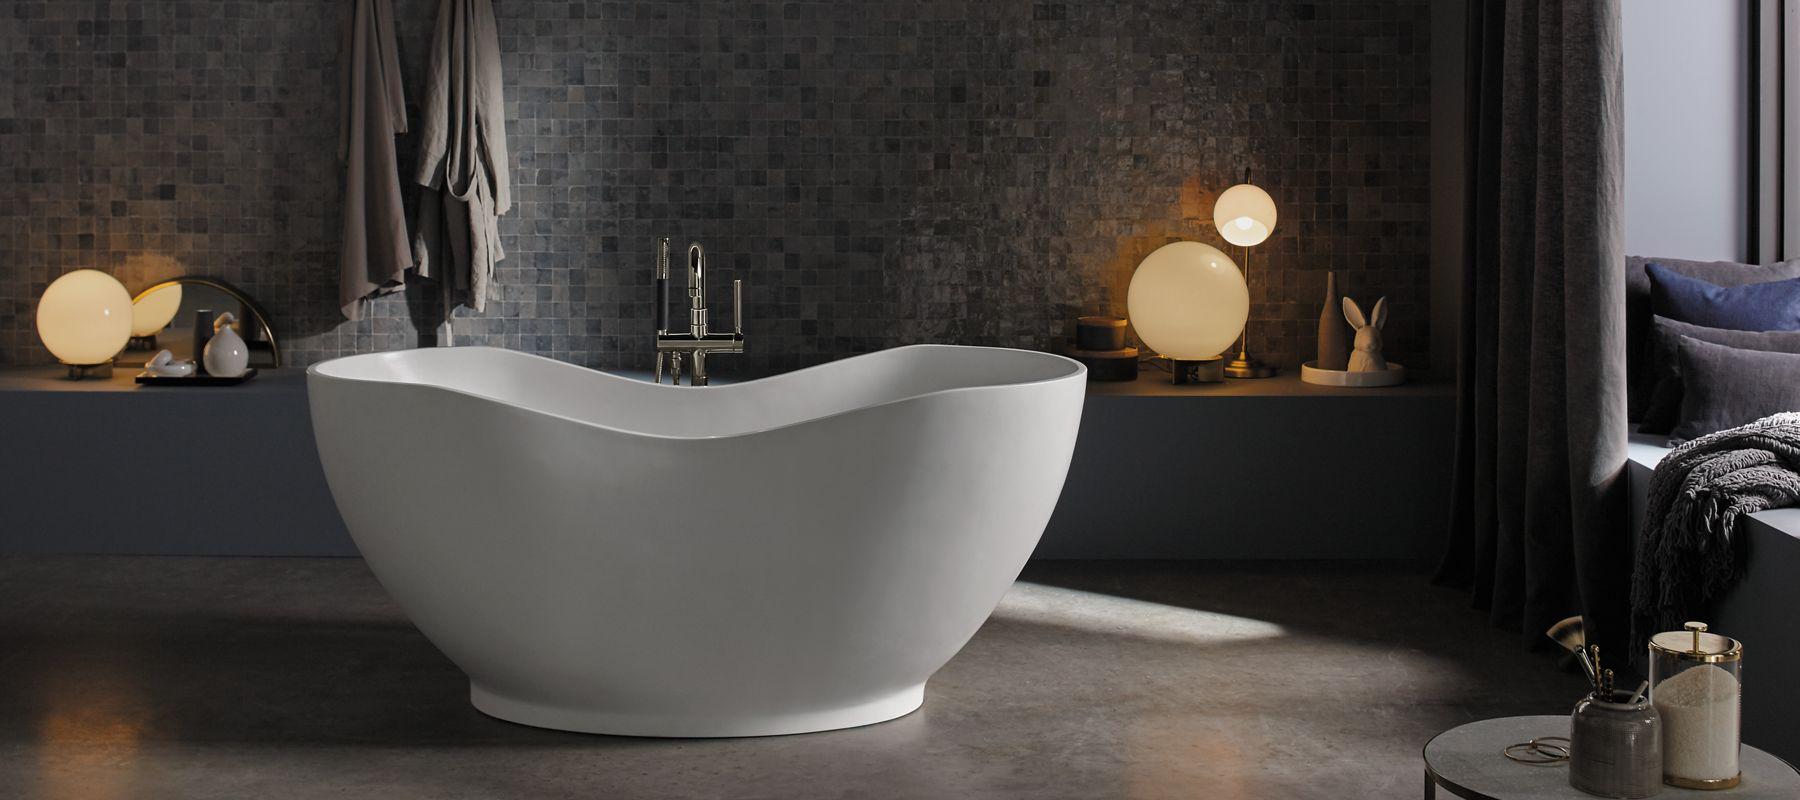 Designer & Luxury Bathing – KOHLER on hong kong bathroom design, puerto rico bathroom design, island bathroom design, south africa bathroom design, zen style bathroom design, florida bathroom design, ikea bathroom design, chinese bathroom design,